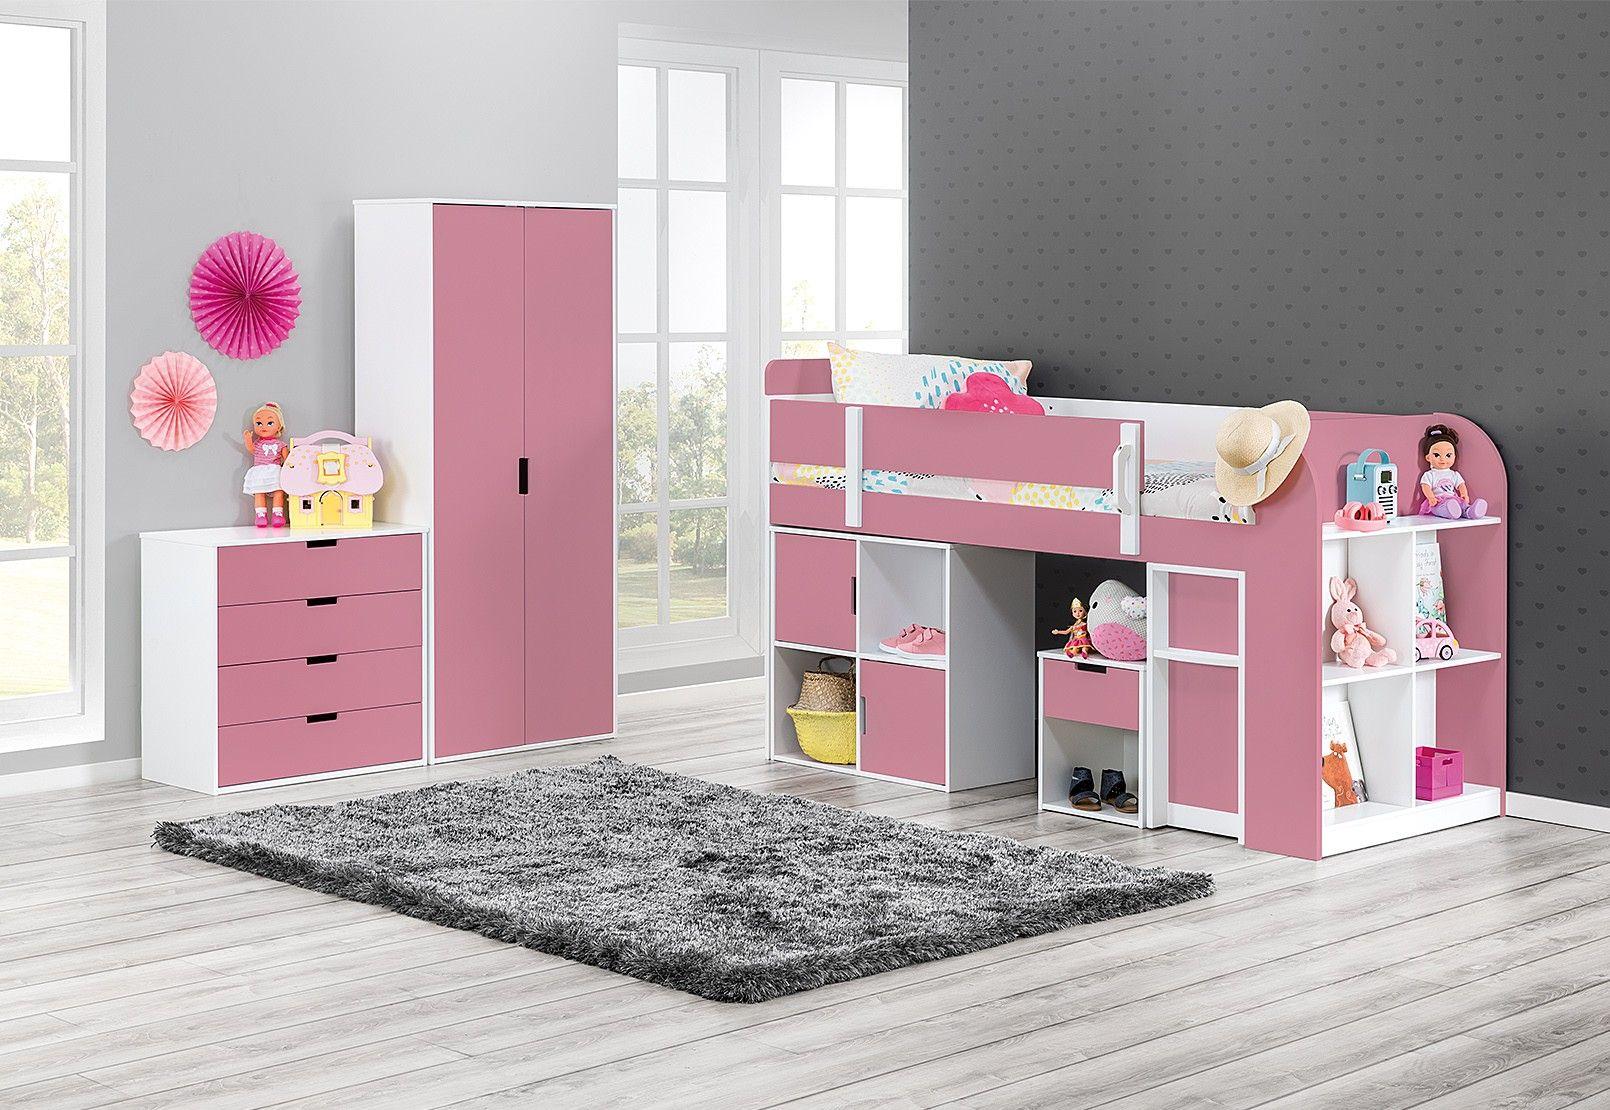 Skittle Single Loft Bunk Bed Amart Furniture Loft Bunk Beds